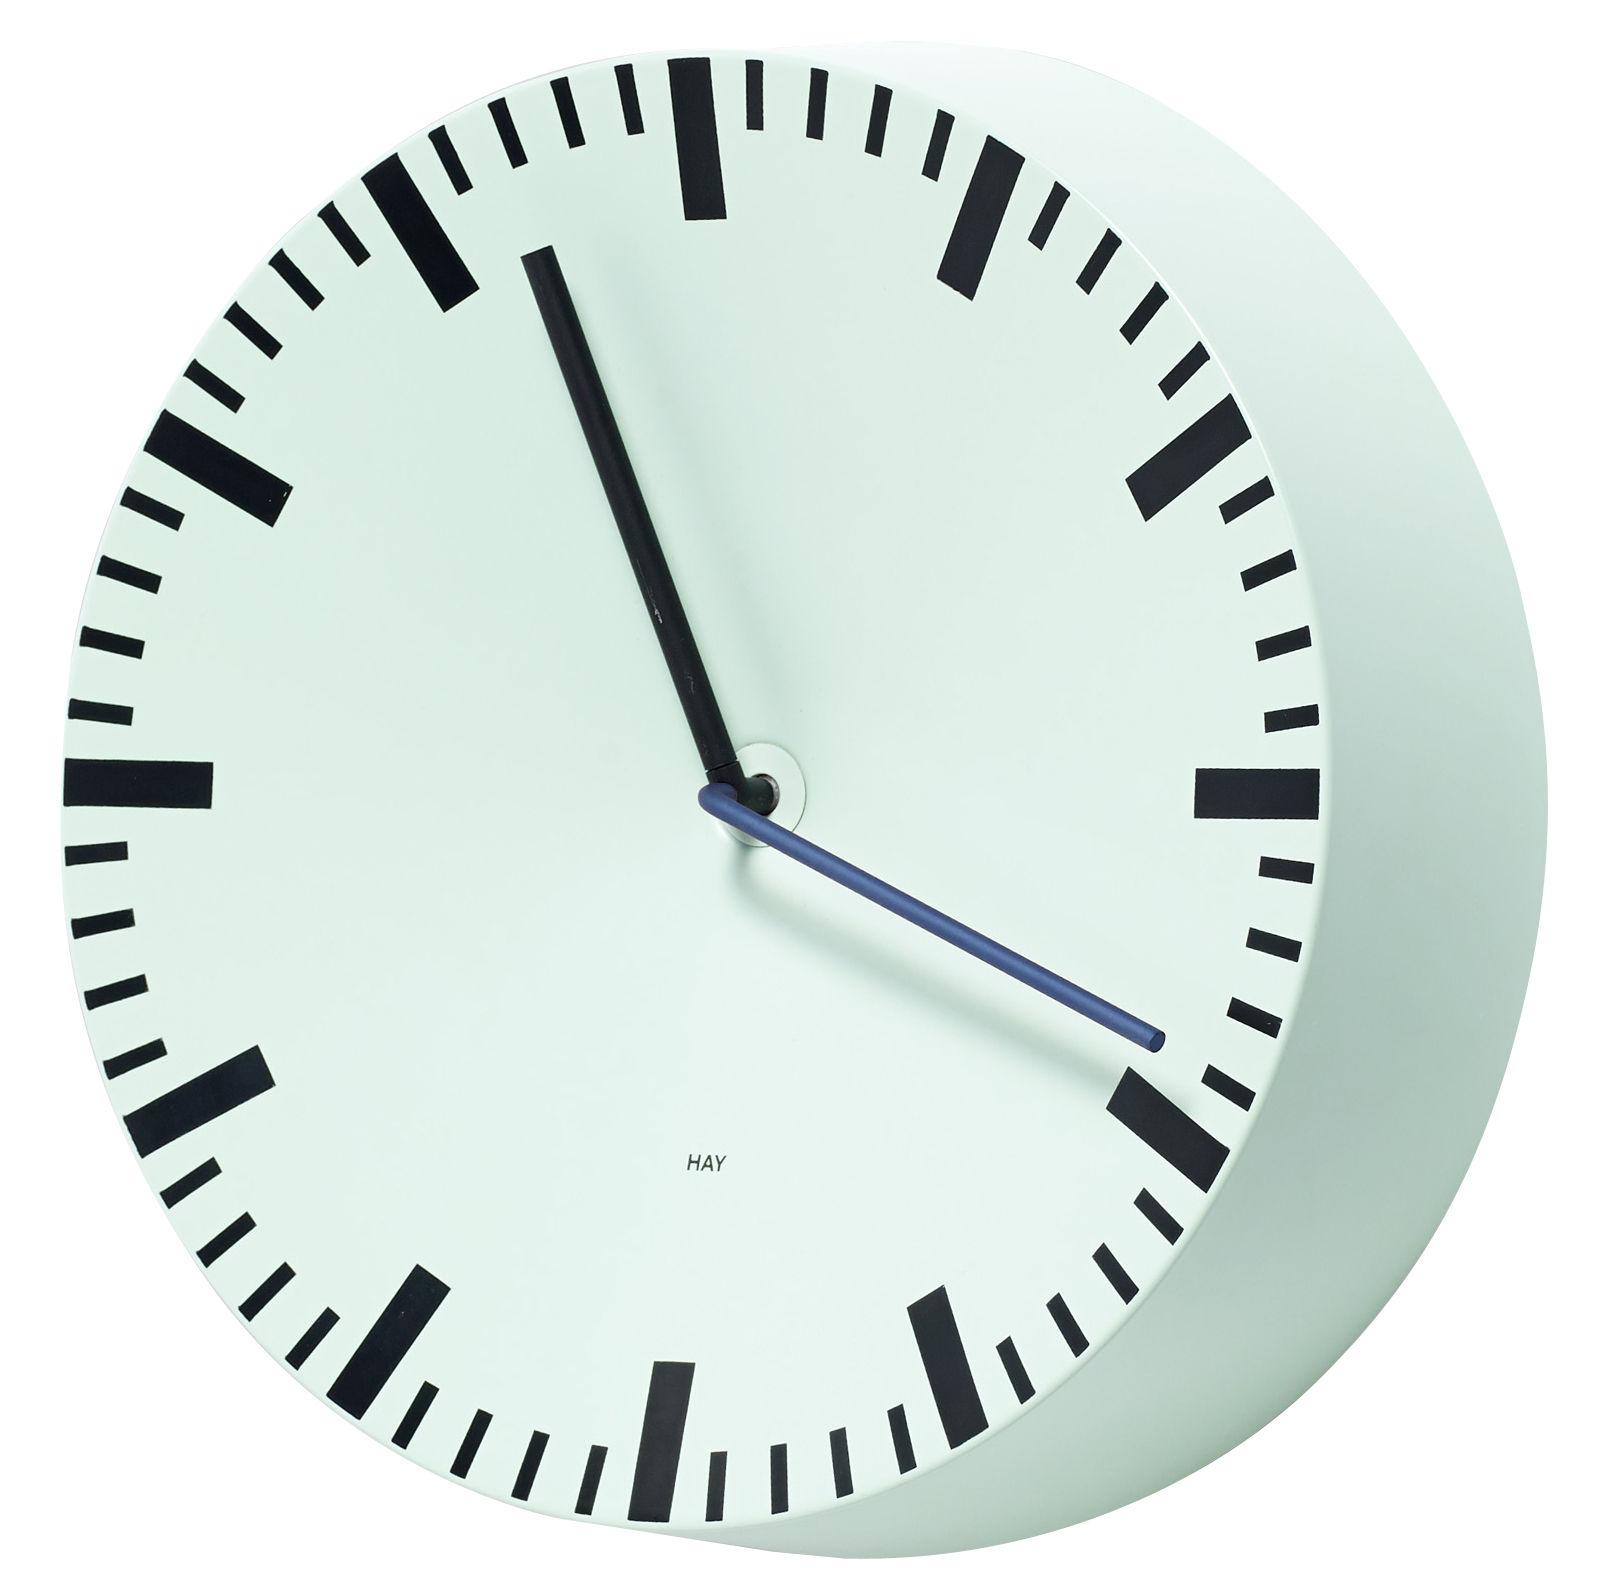 Déco - Horloges  - Horloge murale Analog / Ø 27 cm - Hay - Vert menthe - Aluminium peint